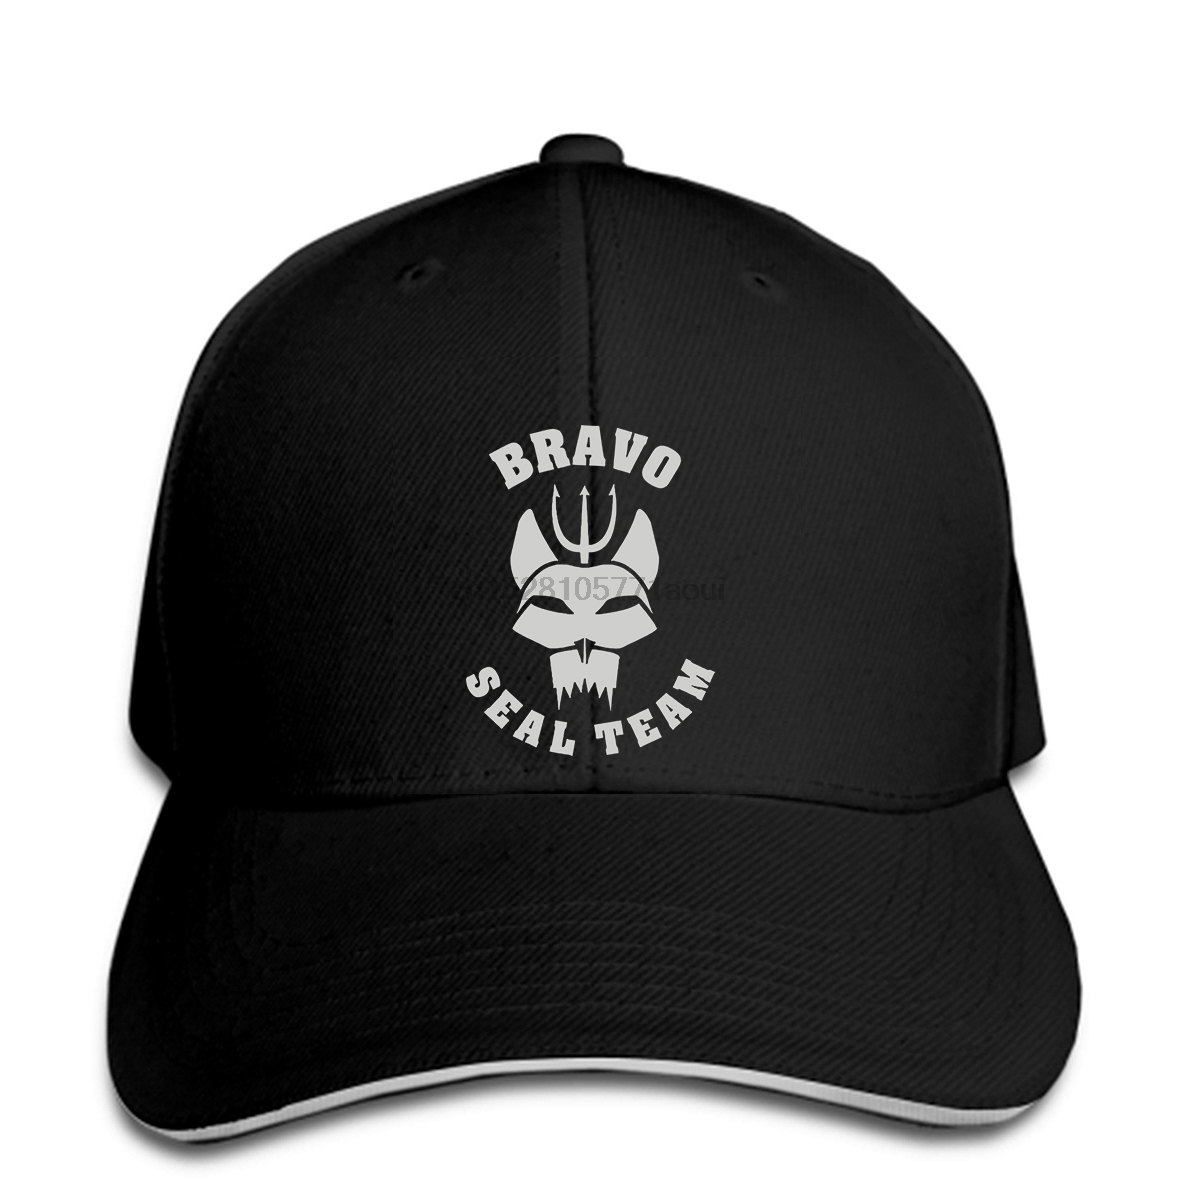 Baseball cap New Bravo SEAL TEAM Navy Tv Series Black Baseball caps